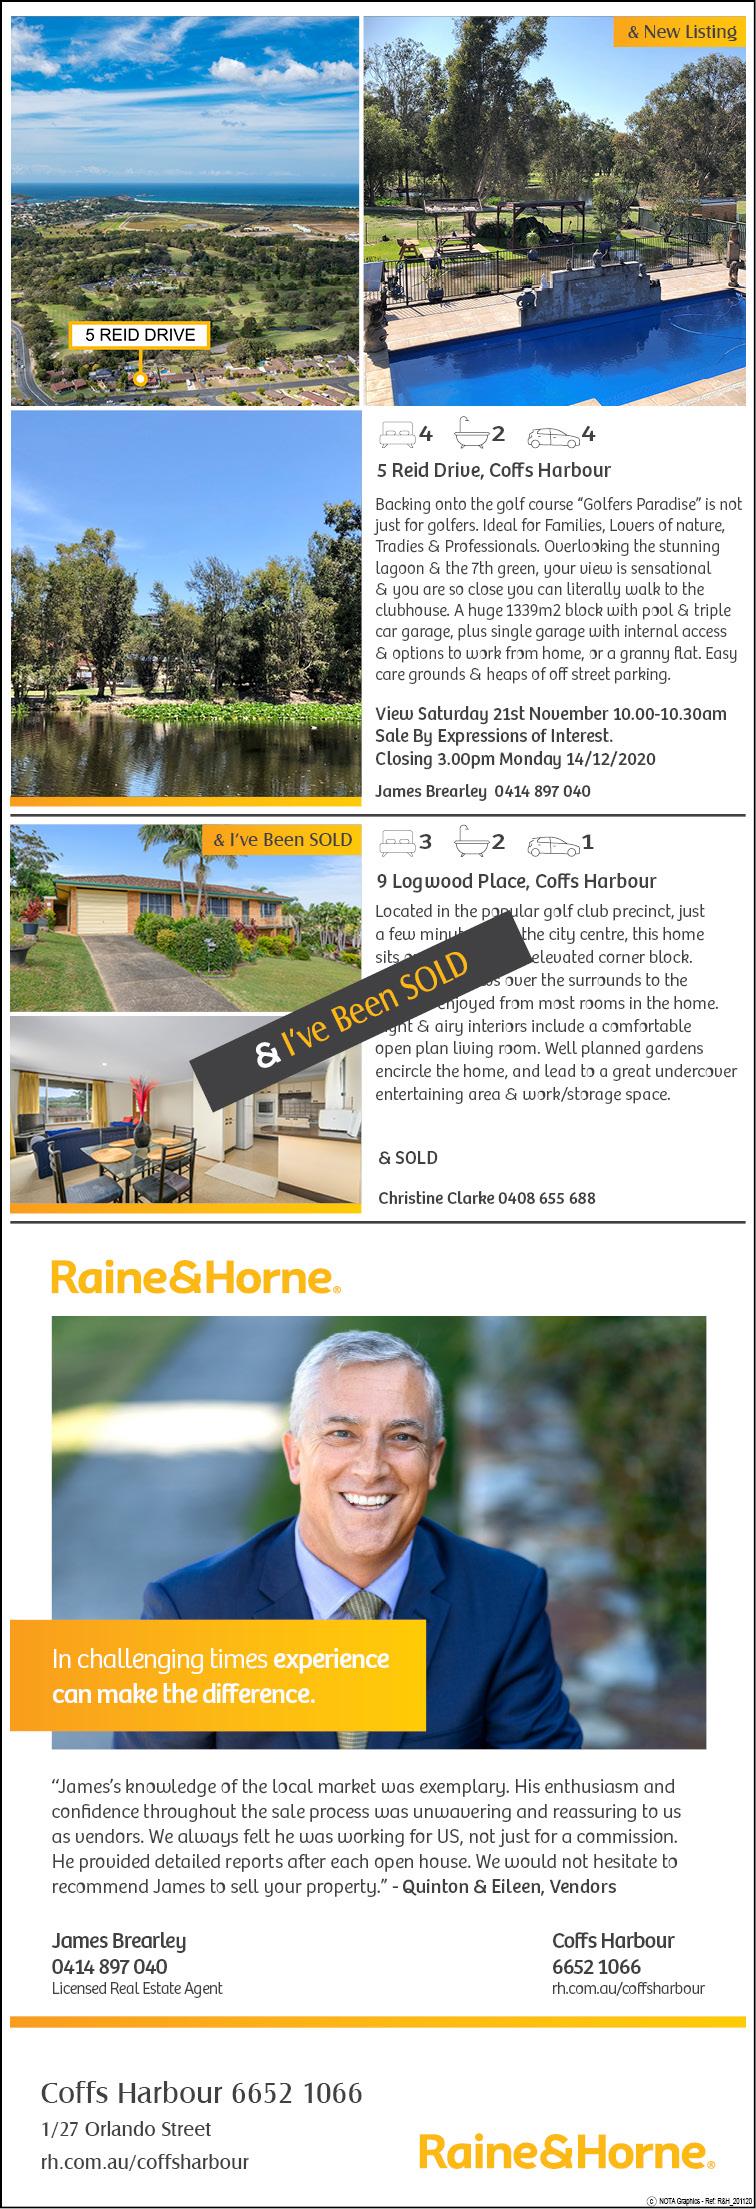 Raine & Horne Coffs Harbour